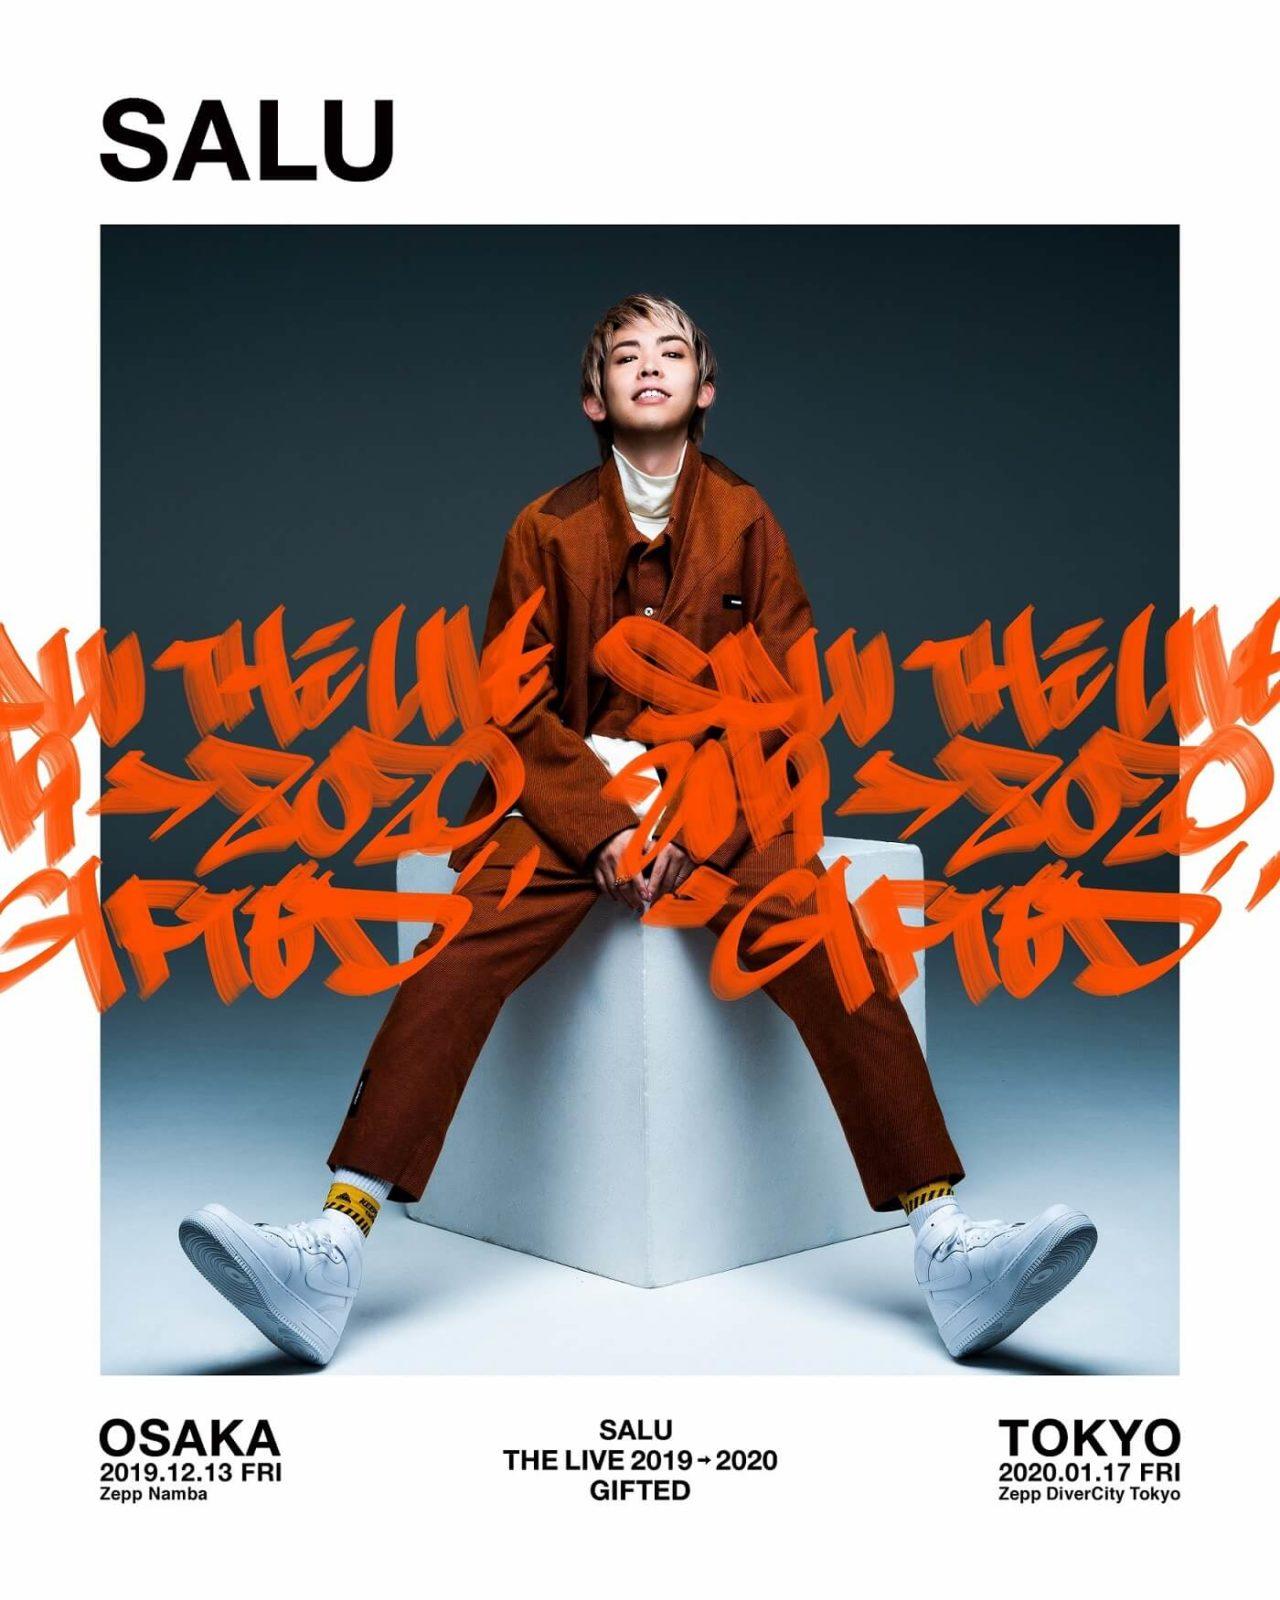 SALU、ワンマンライブ大阪公演に先駆けてグッズ発表!EXILE SHOKICHI&JP THE WAVYもゲスト出演サムネイル画像